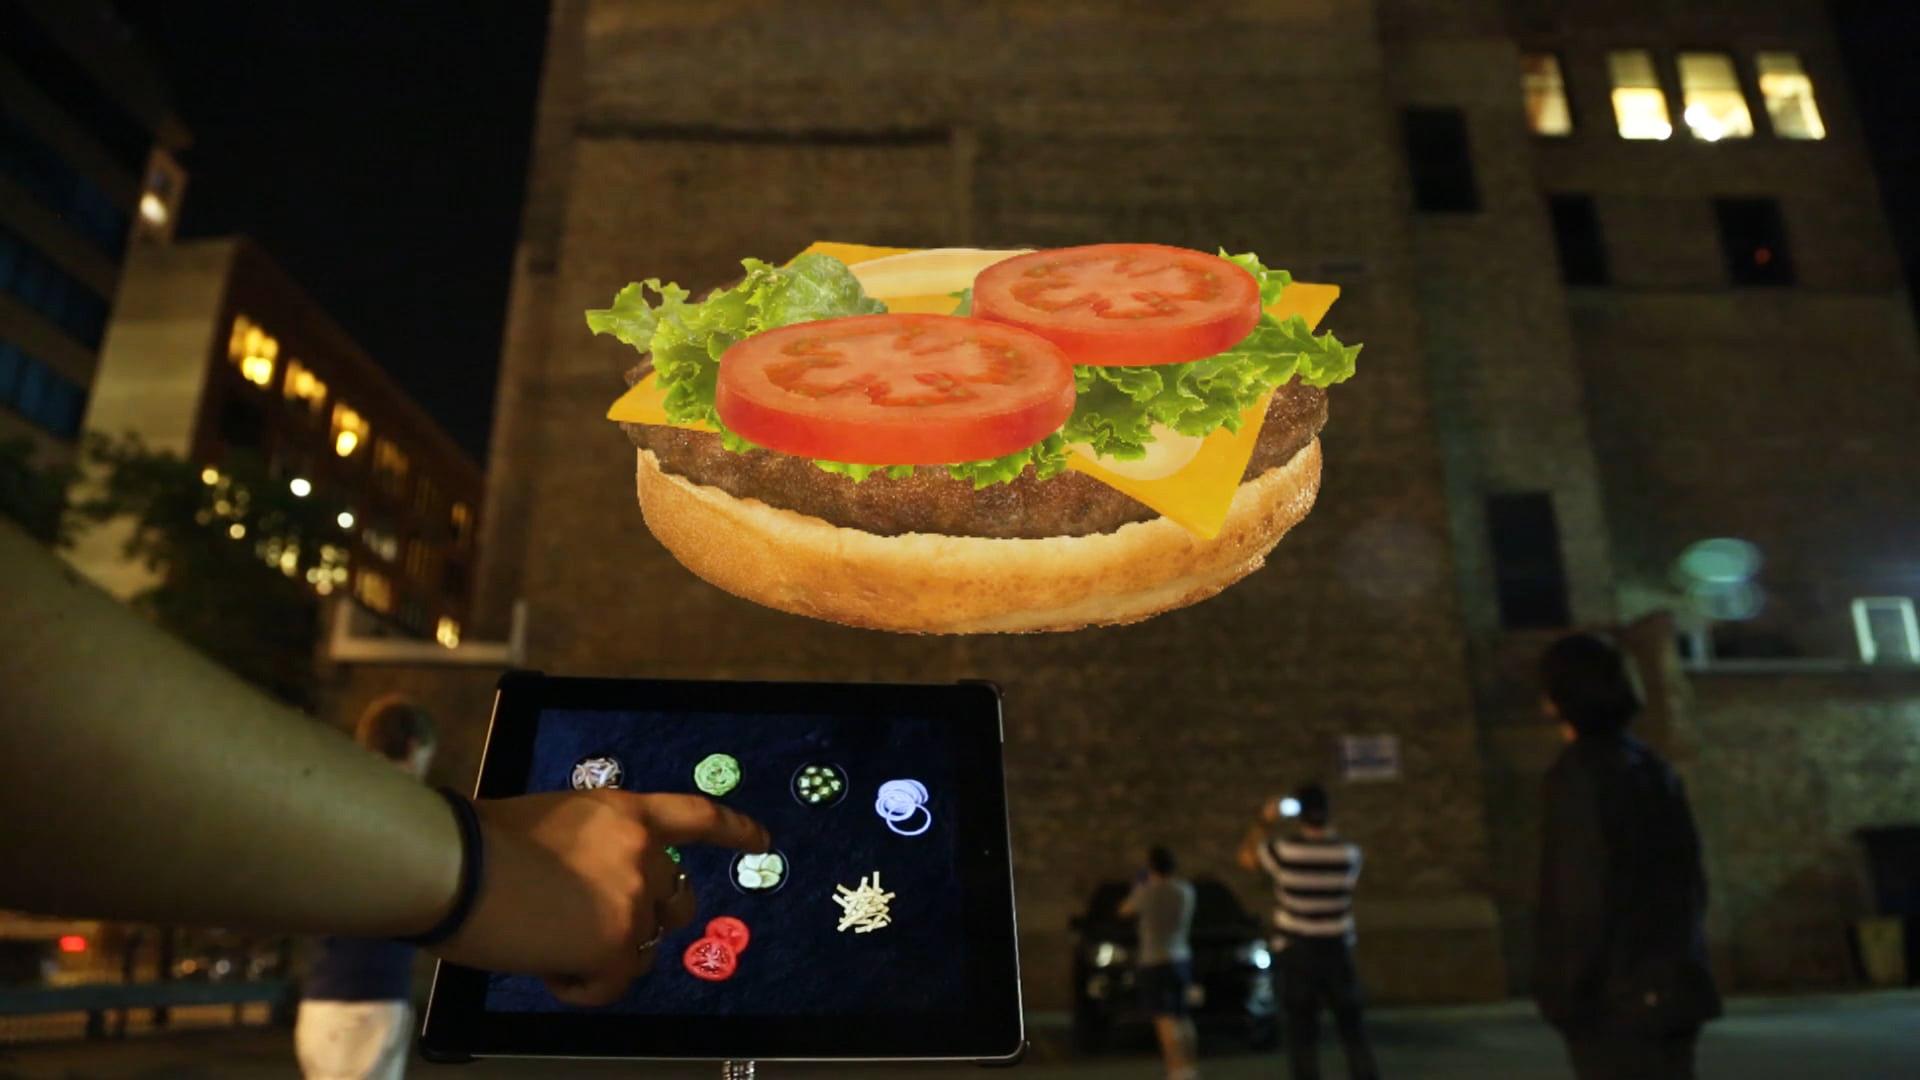 McDonald's - Giant Virtual Burger Builder